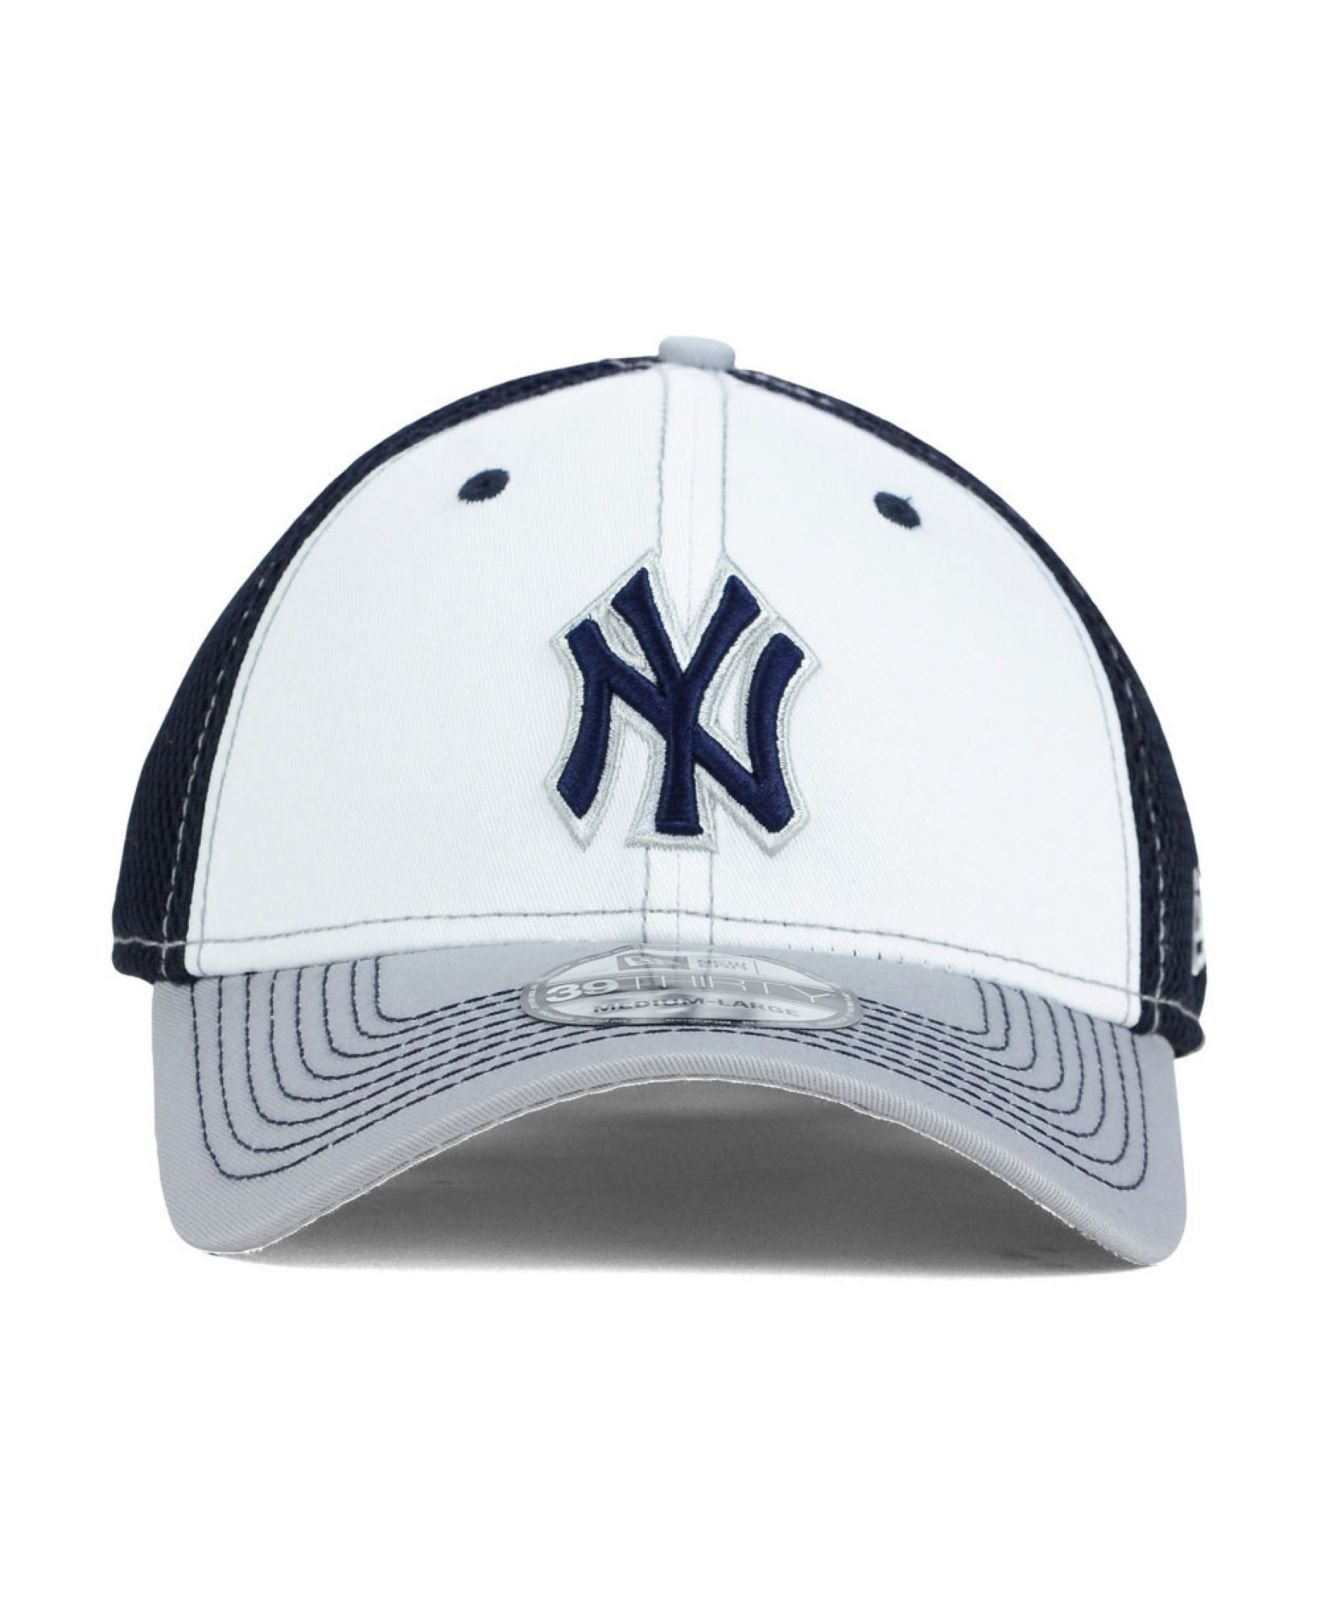 27be023e9 ... new style lyst ktz new york yankees neo 39thirty cap in blue for men  eddac b15d3